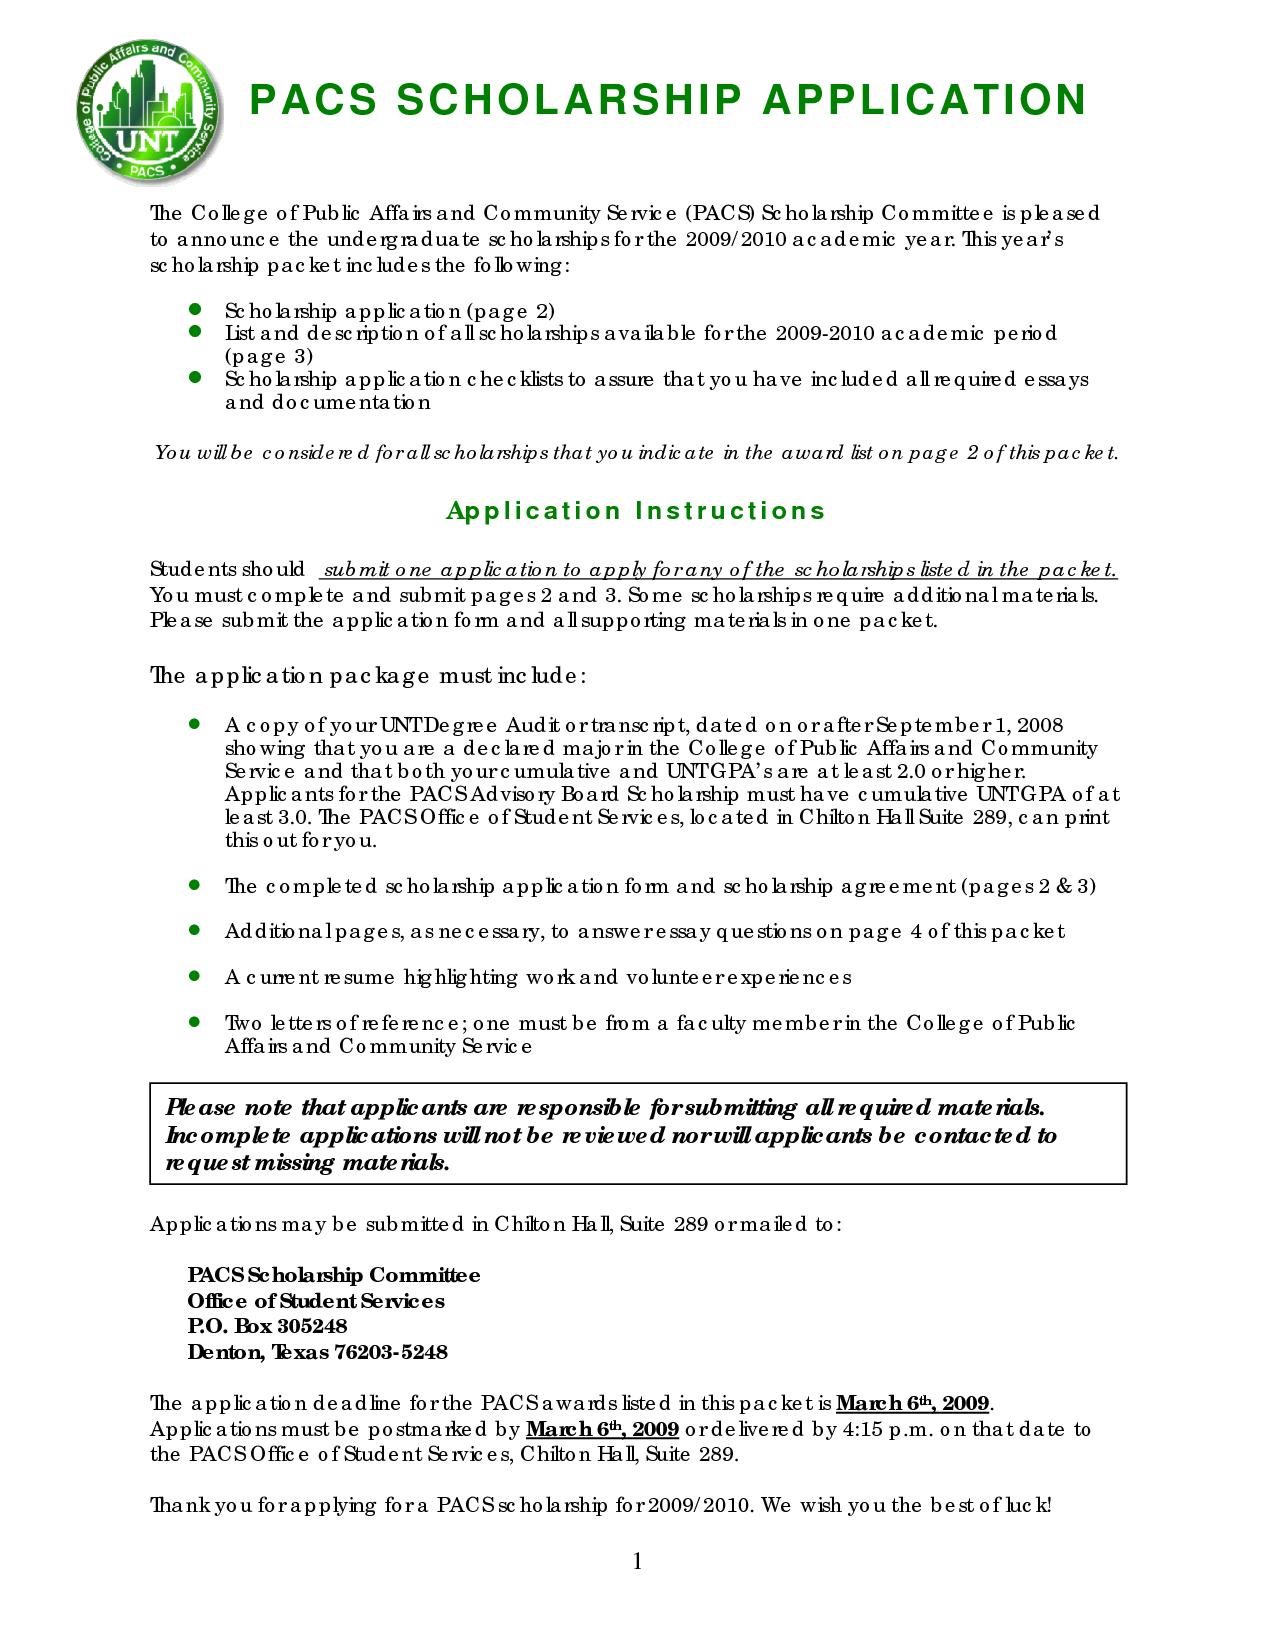 005 Short Essay Scholarships Zxsaqrl81t Amazing College Easy Full